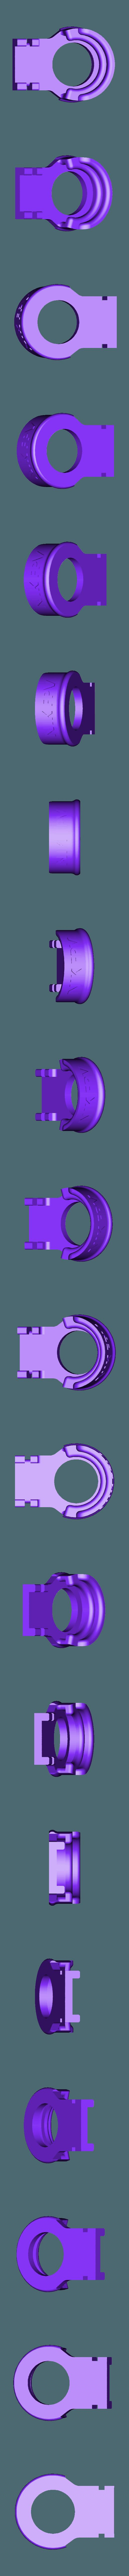 QAV-X_210_Motor_Protection_v3.stl Download free STL file QAV-X 210 X210 Motor Protection • 3D printing design, nik101968